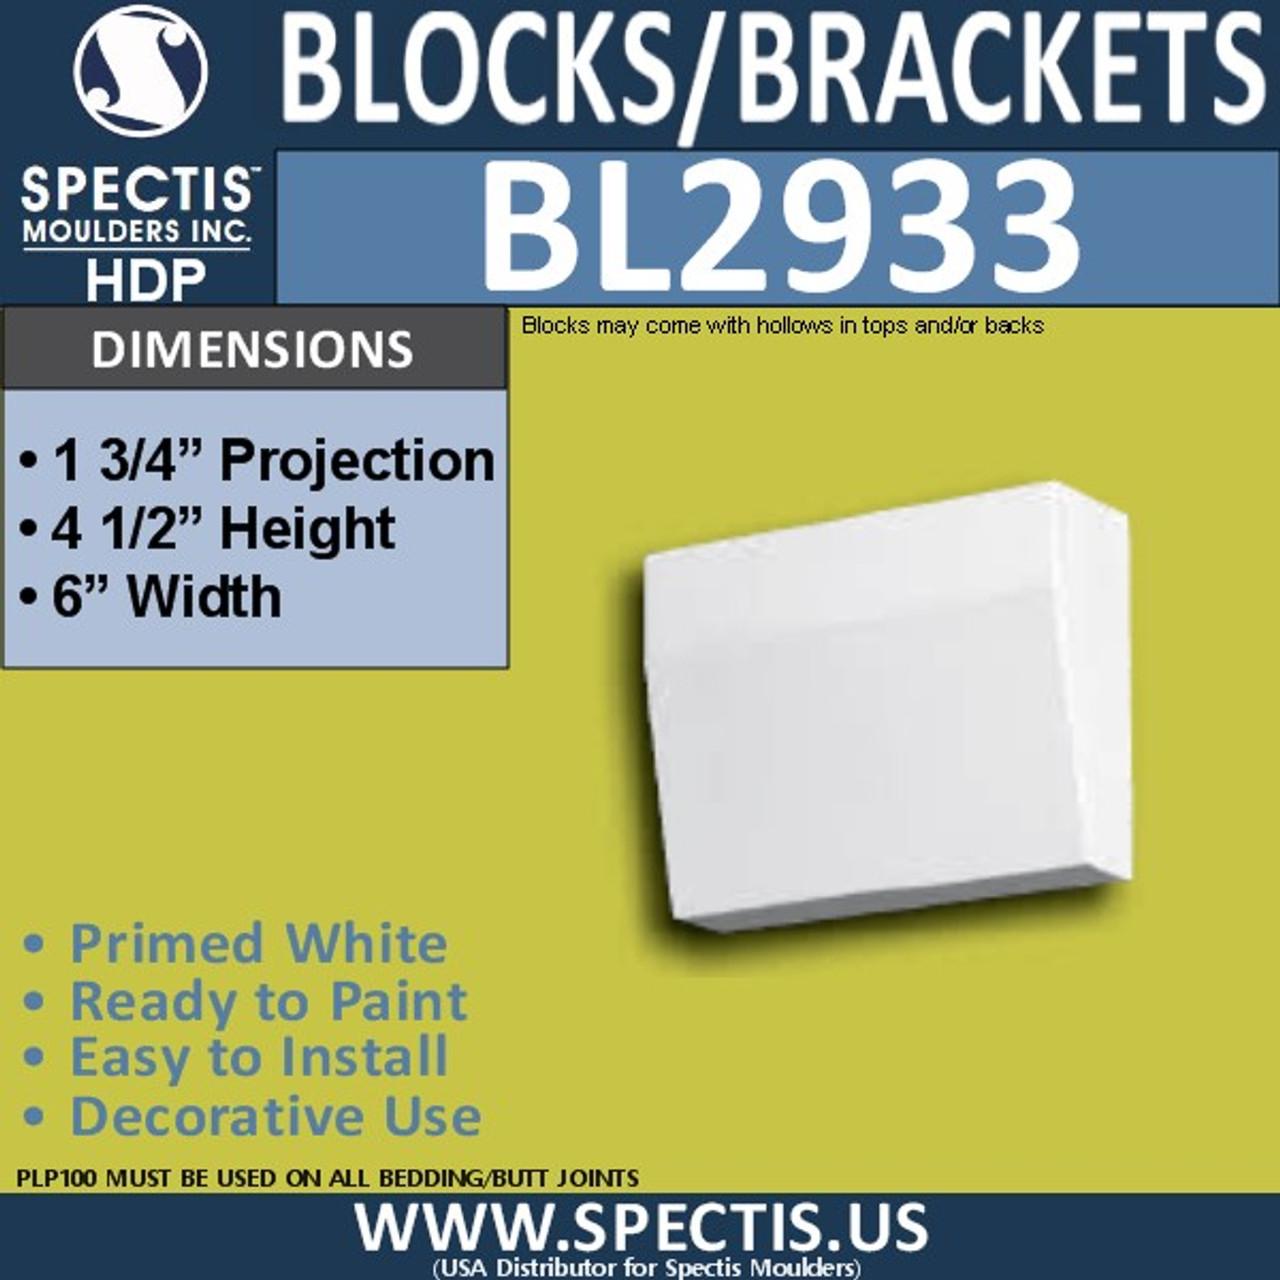 "BL2933 Eave Block or Bracket 6""W x 4.5""H x 1.75"" P"